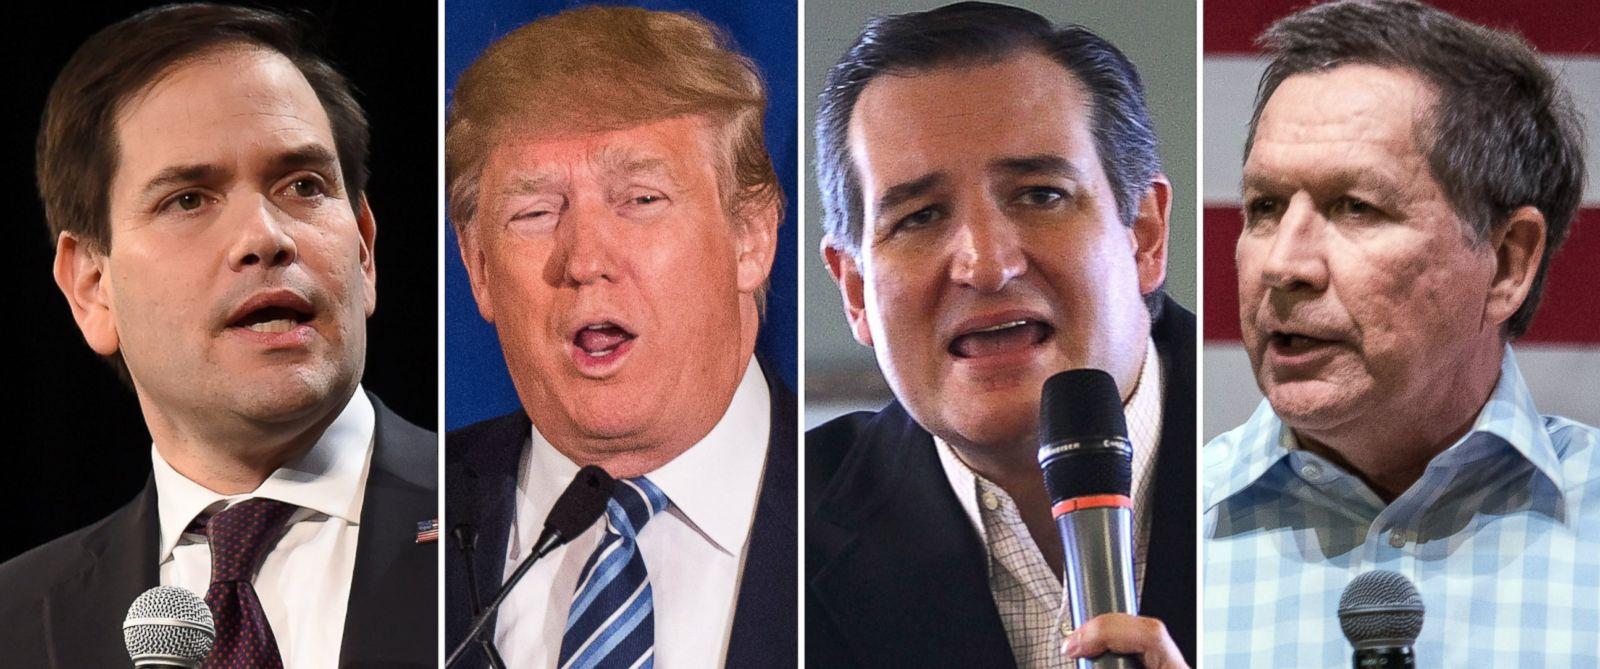 PHOTO: Marco Rubio speaks in Nevada, Feb. 21, Donald Trump speaks in South Carolina, Feb. 18, 2016, Ted Cruz speaks in South Carolina, Feb. 17, and John Kasich speaks in South Carolina, Feb. 18, 2016.